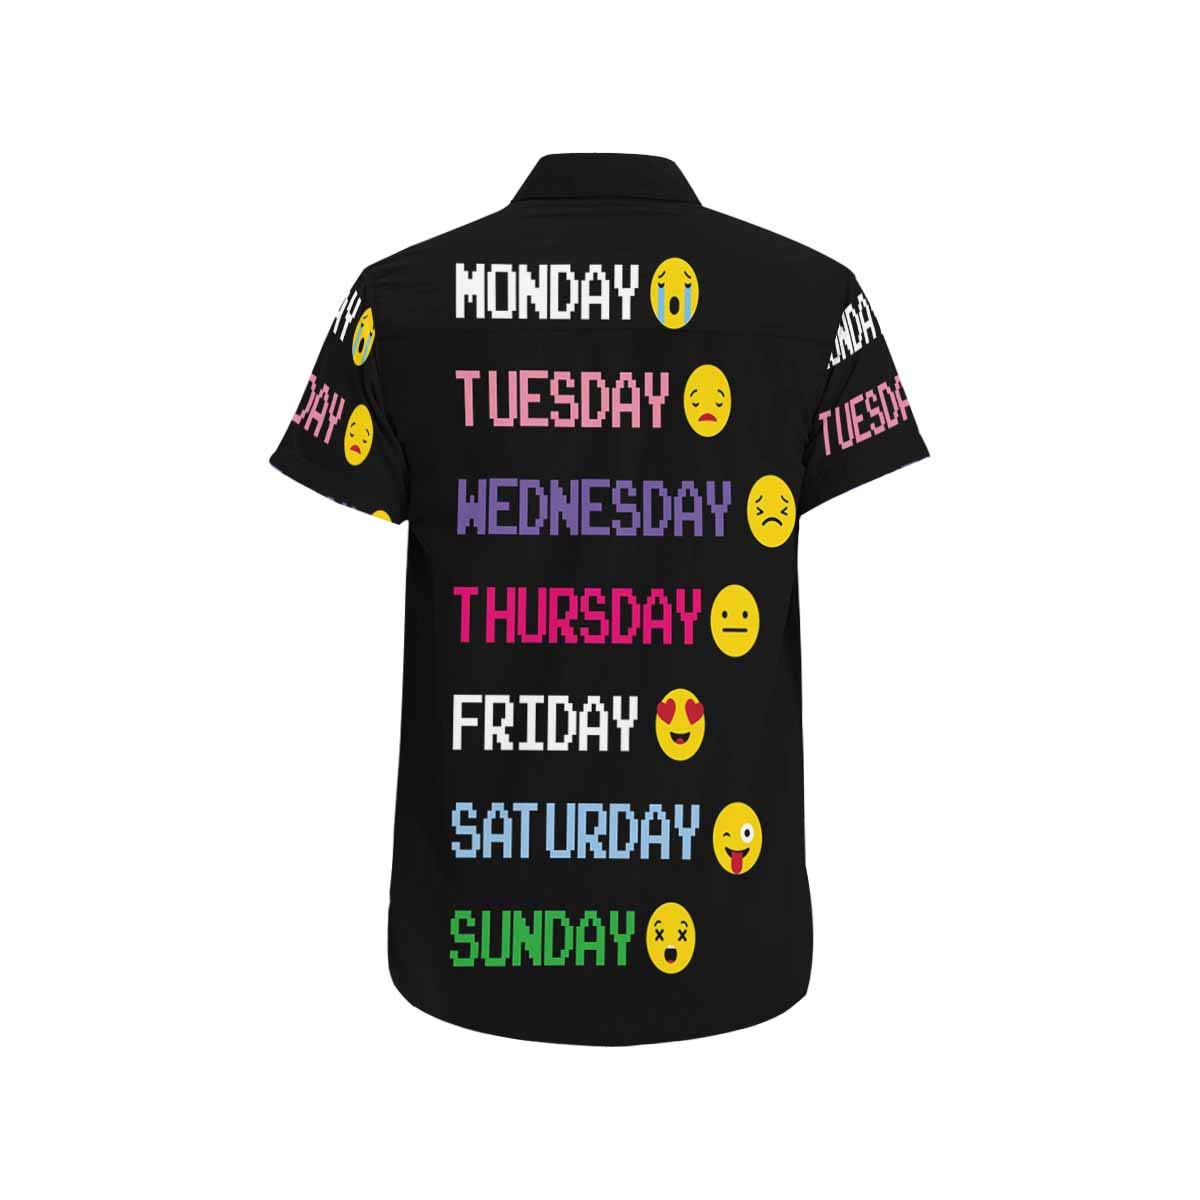 InterestPrint Button Up Monaday to Sunday Emoticon Short Sleeve Regular Fit